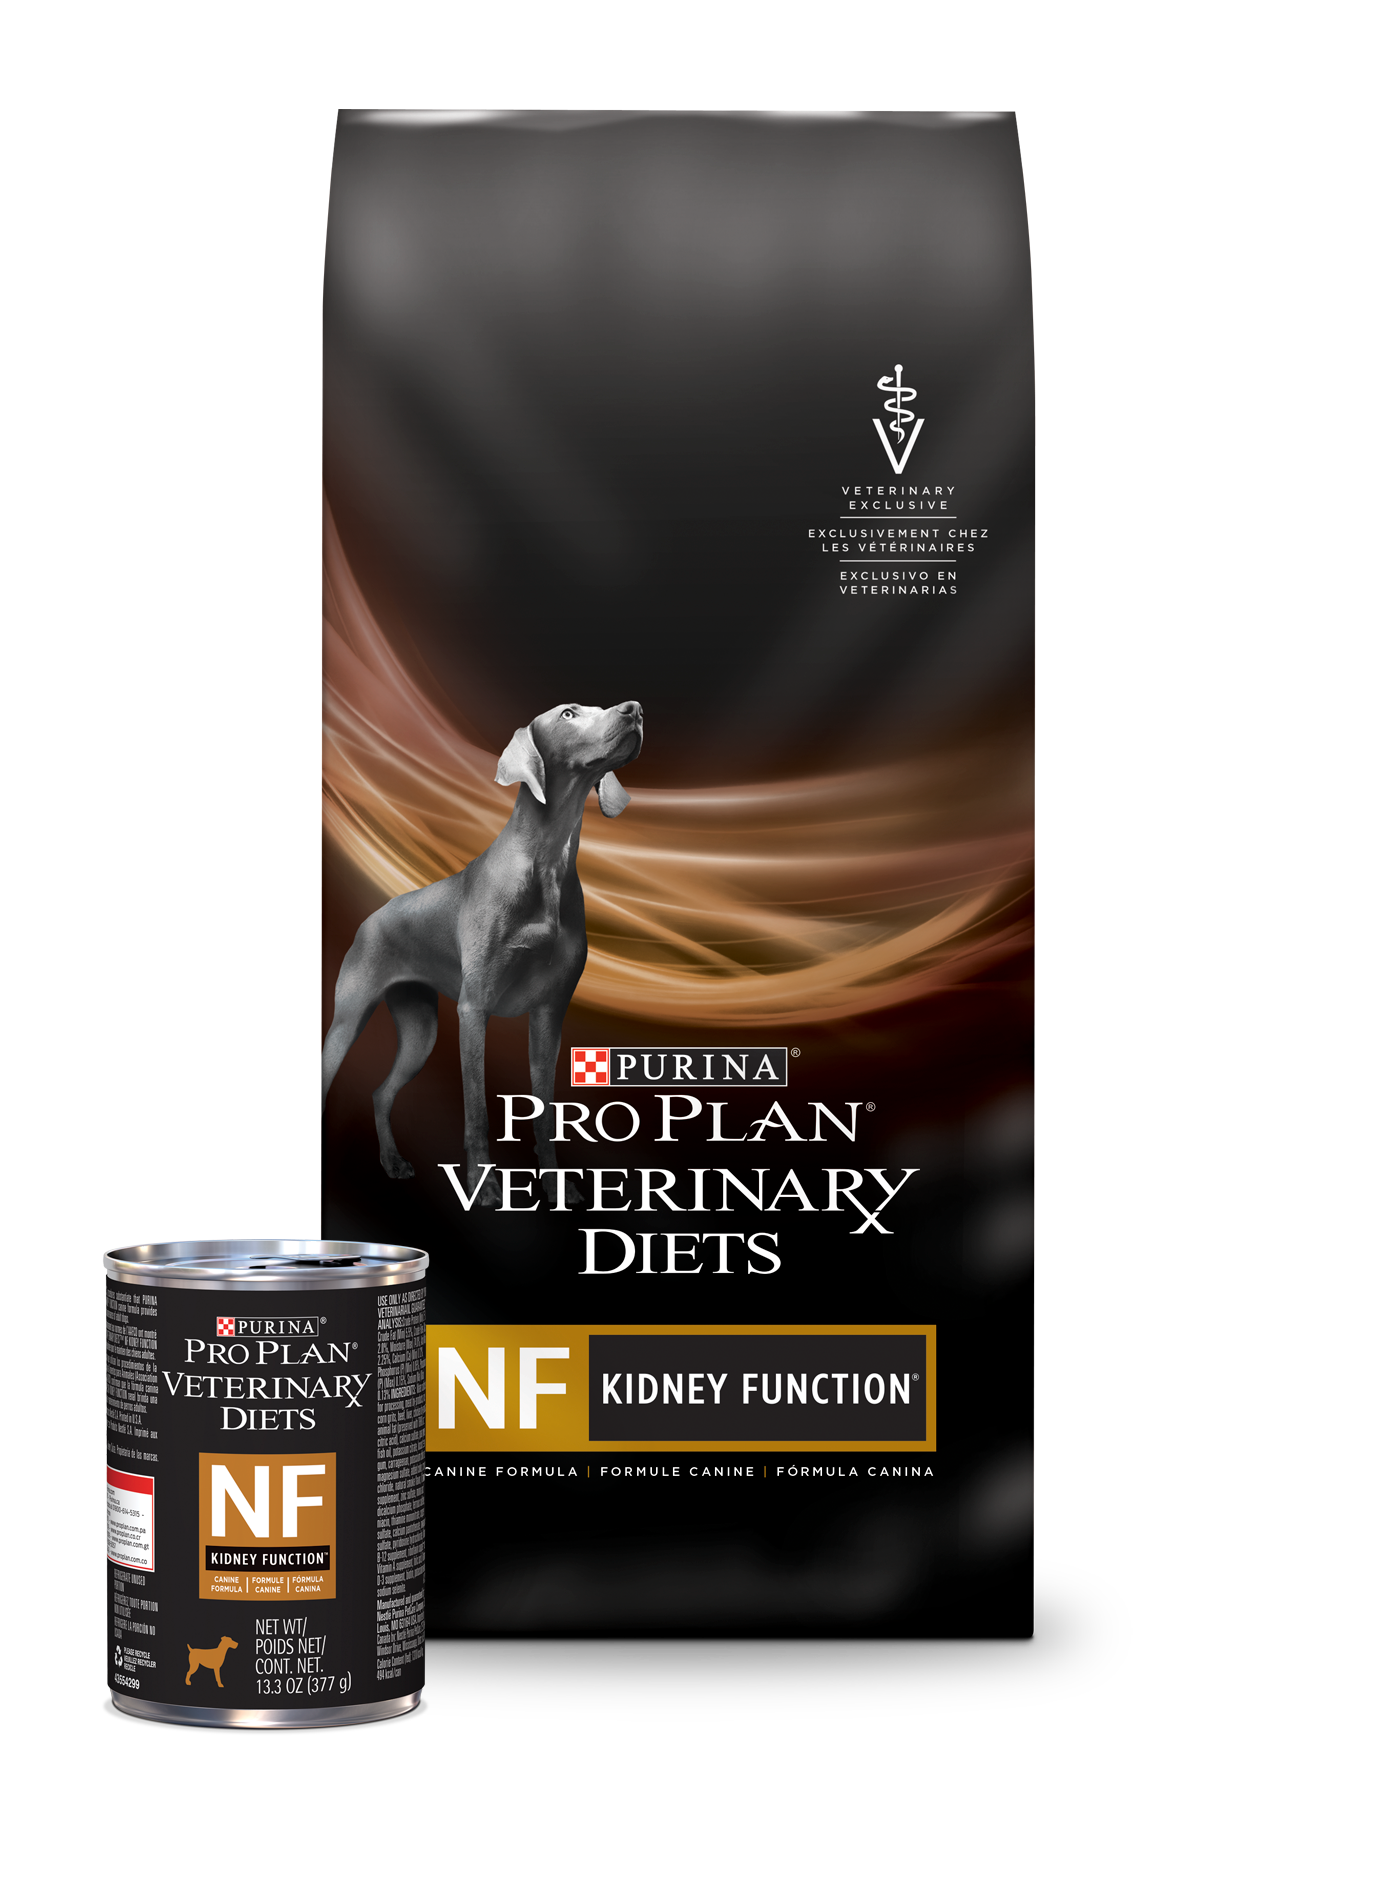 Nf Kidney Function Dog Food Dog Food Recipes Food Purina Pro Plan